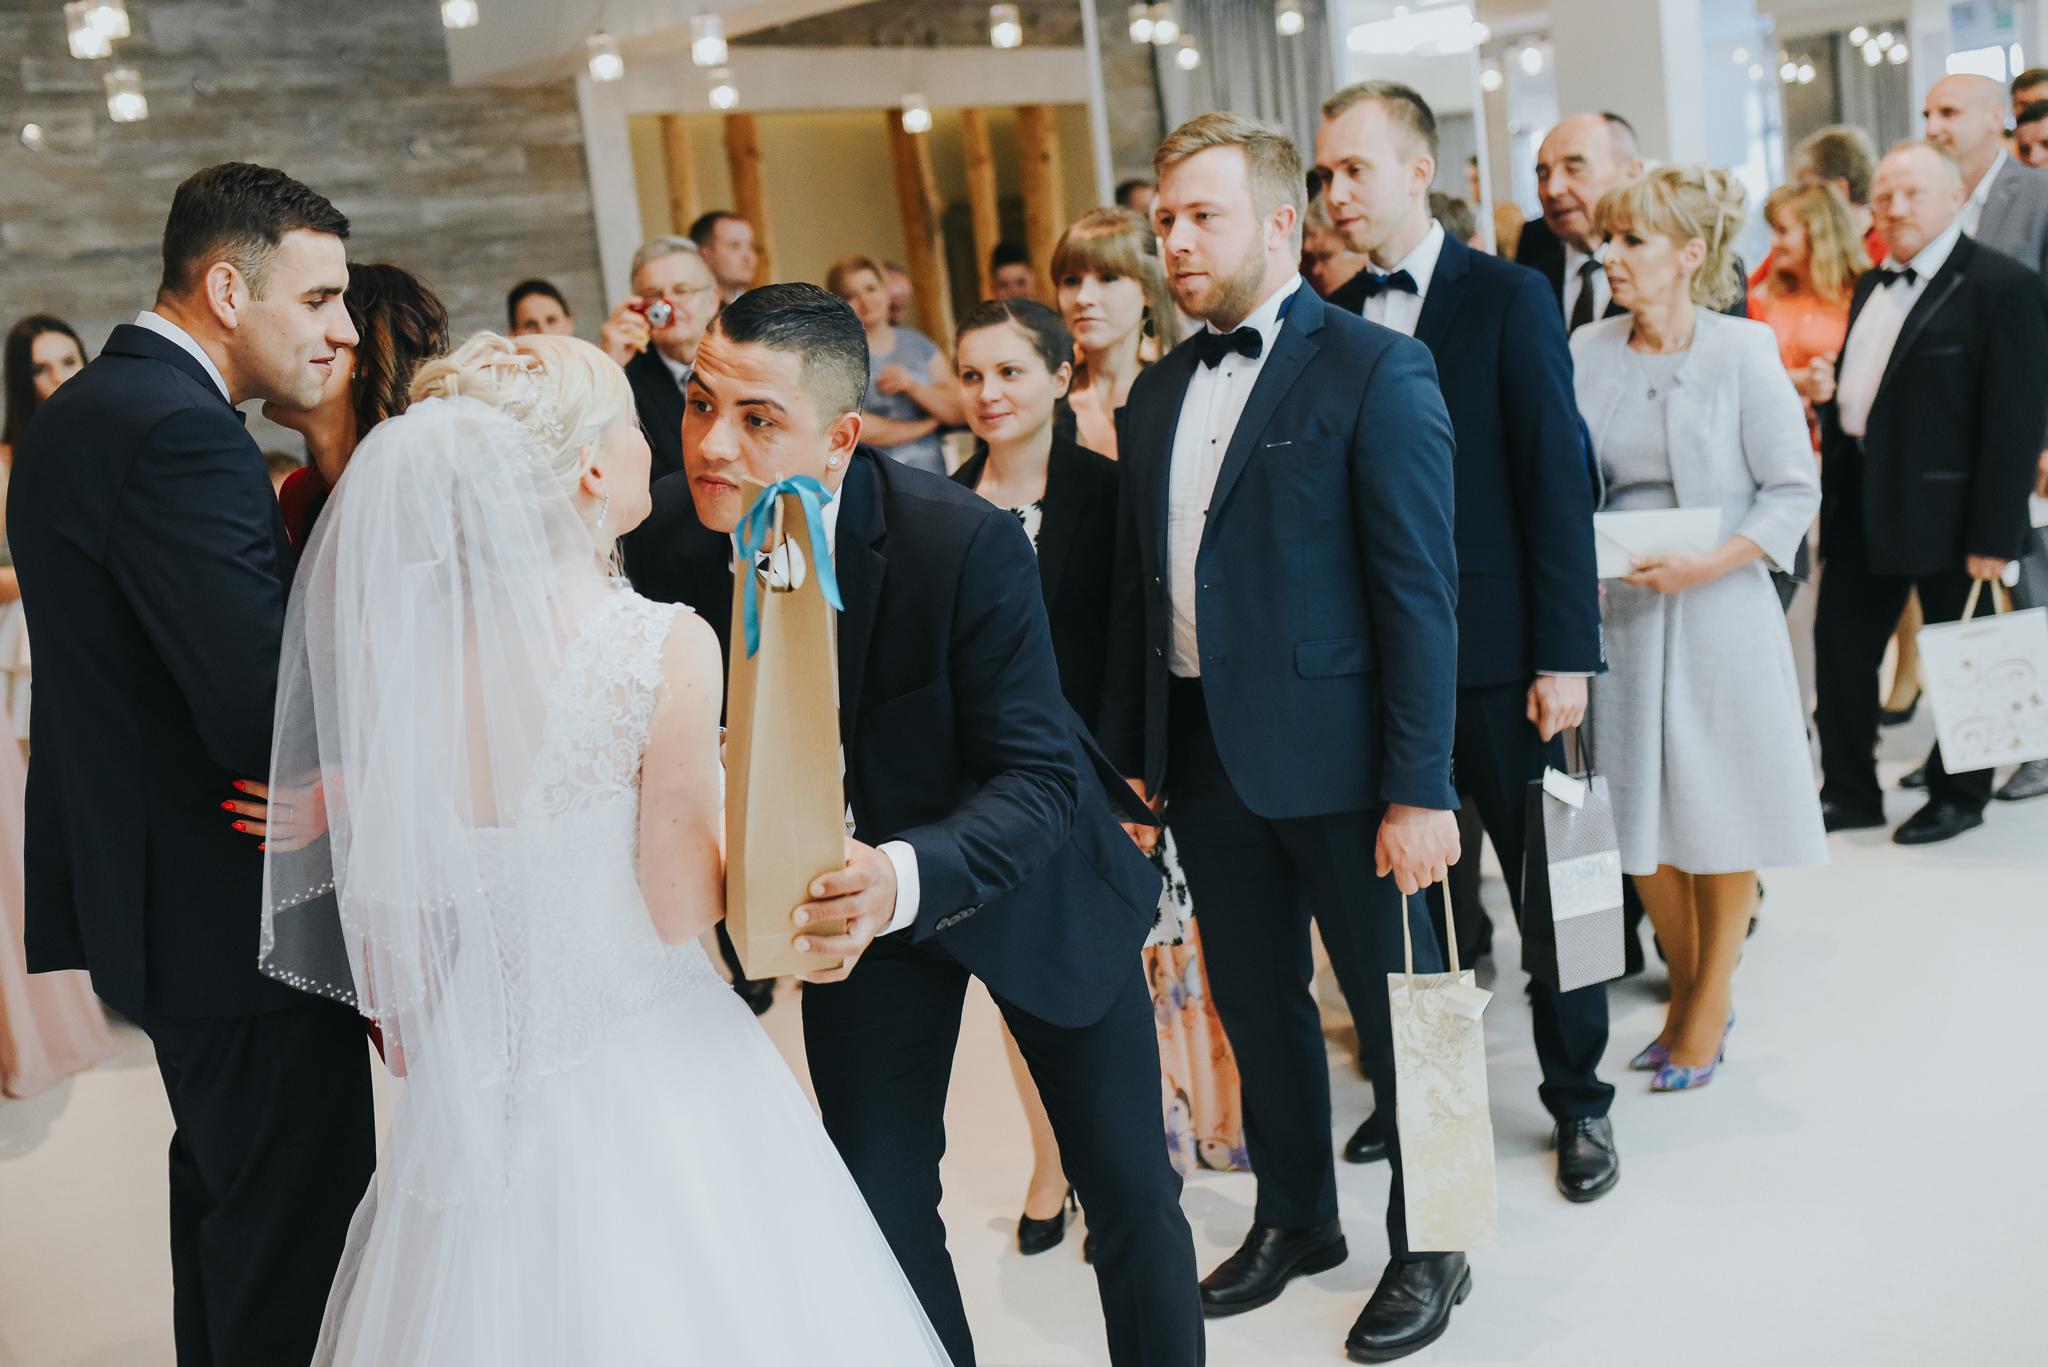 0521_Paulina&Bartosz________fotoreportaz_ze_slubu_sosnie_wesela_kaczory_deluxe_____fotografia_slubna_www_amfoto_pl_AMF_0622.jpg